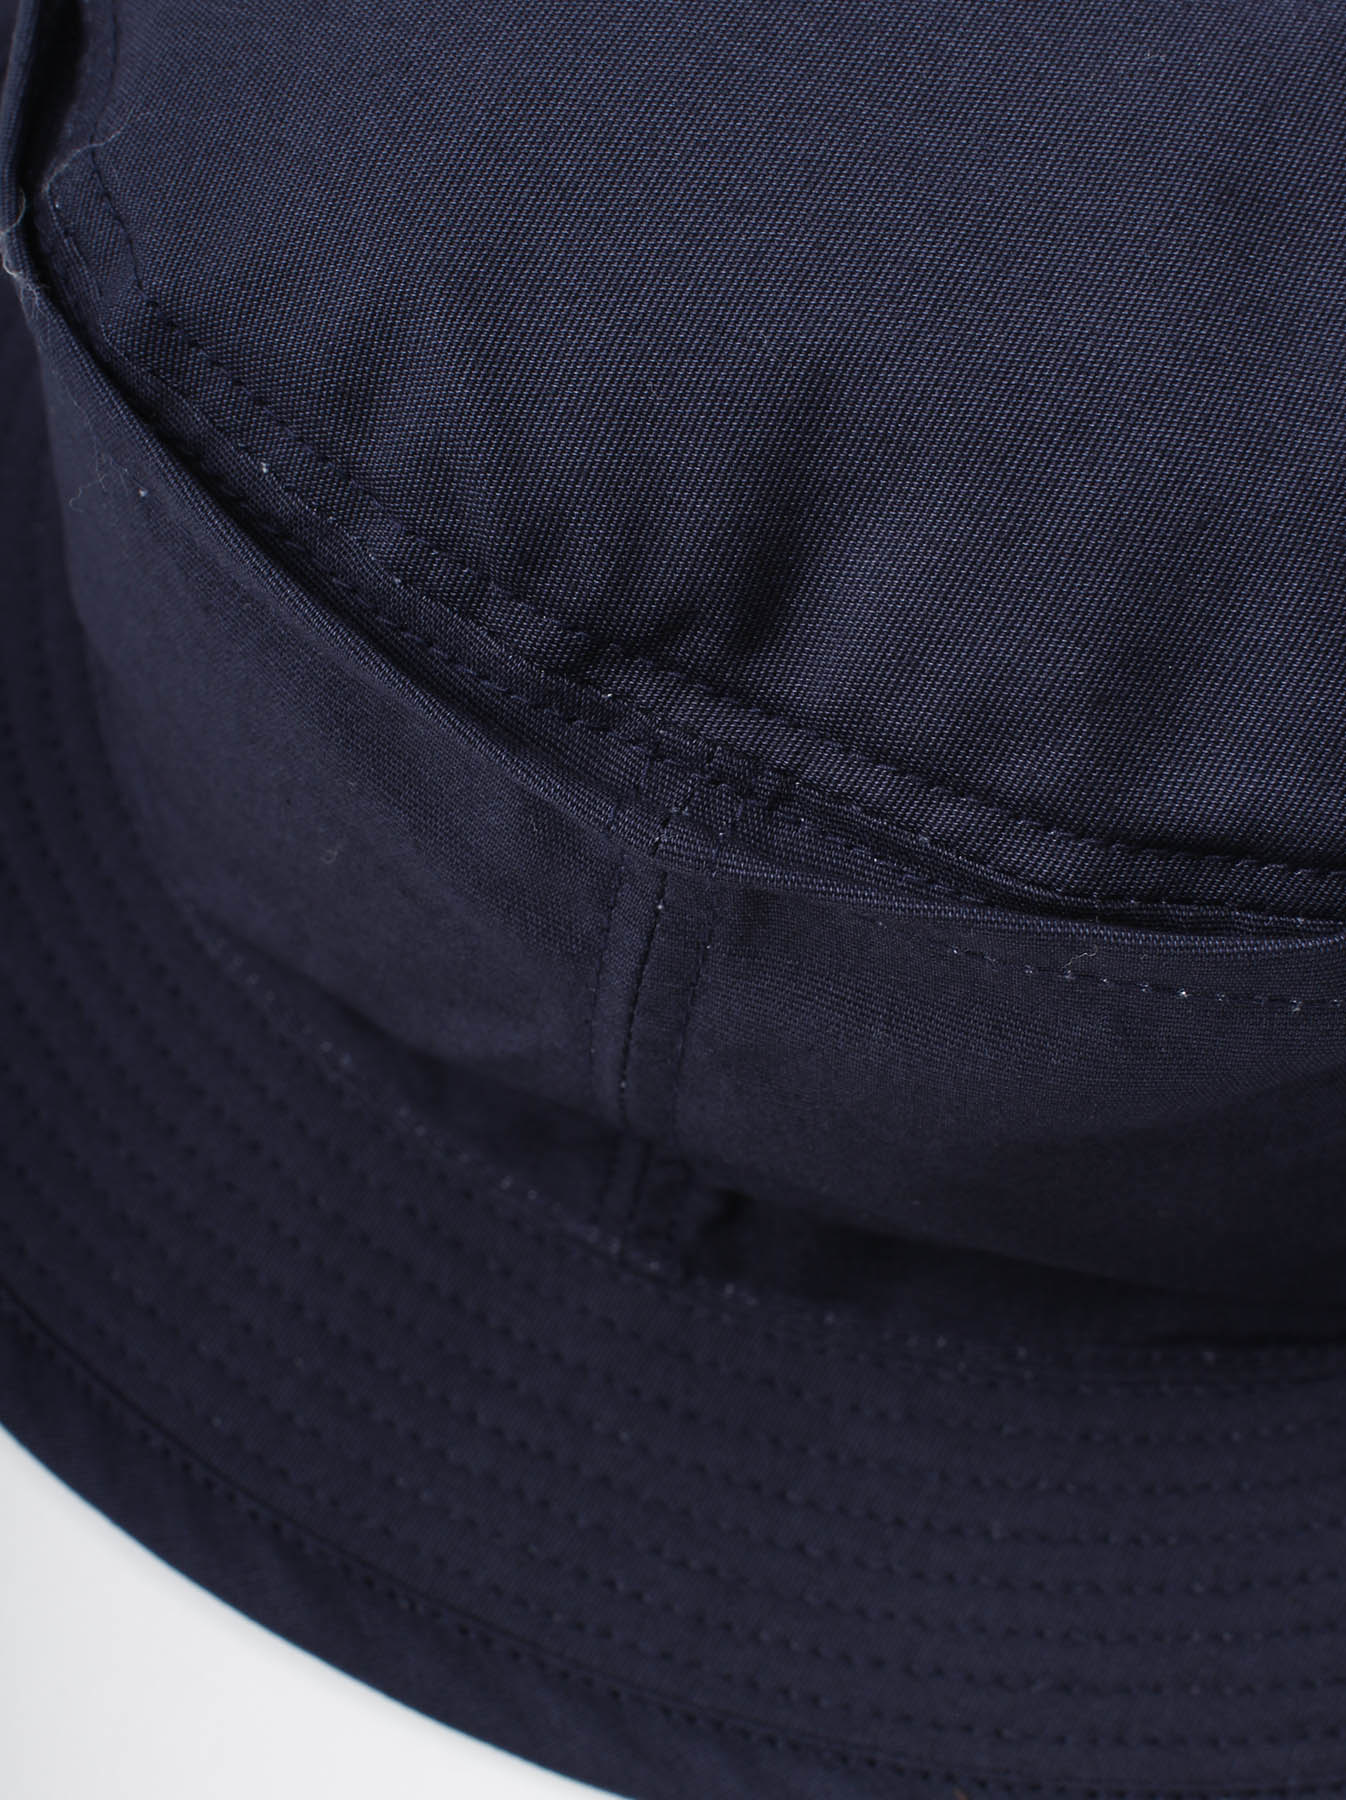 WH Umiiloha Hat-10